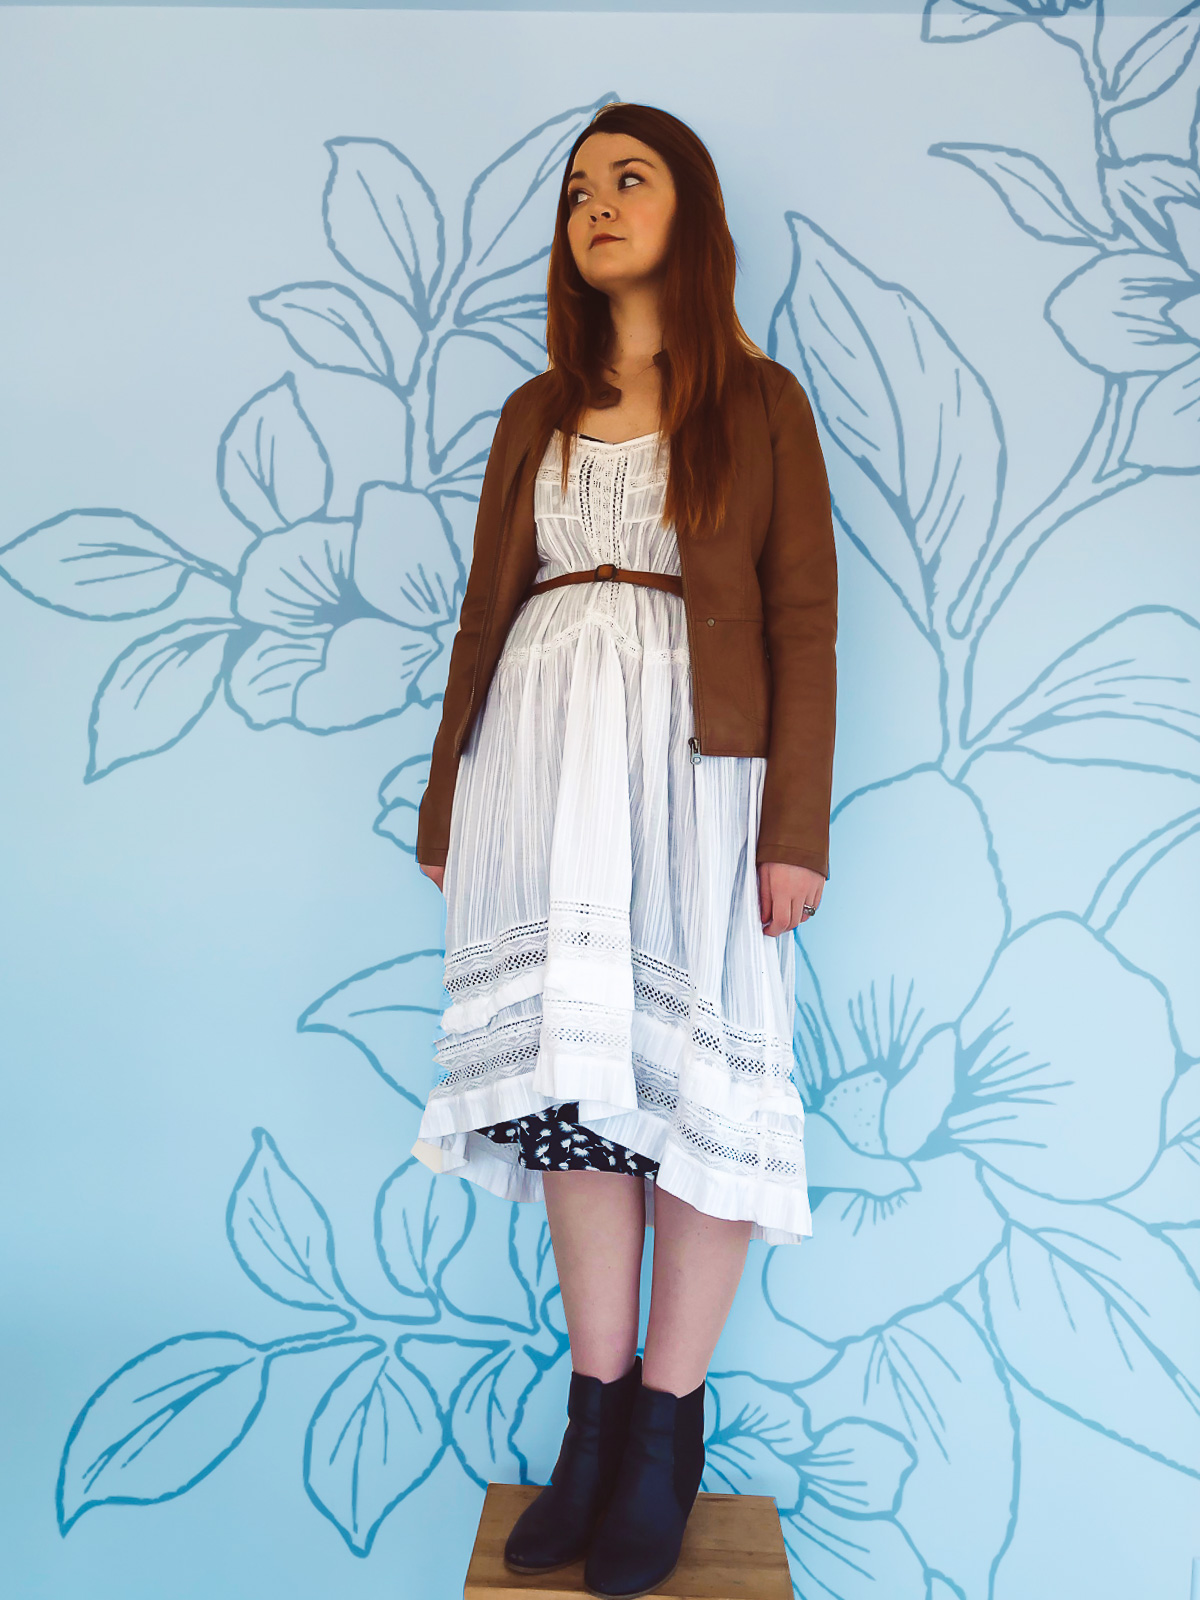 01-white dress 1.jpg